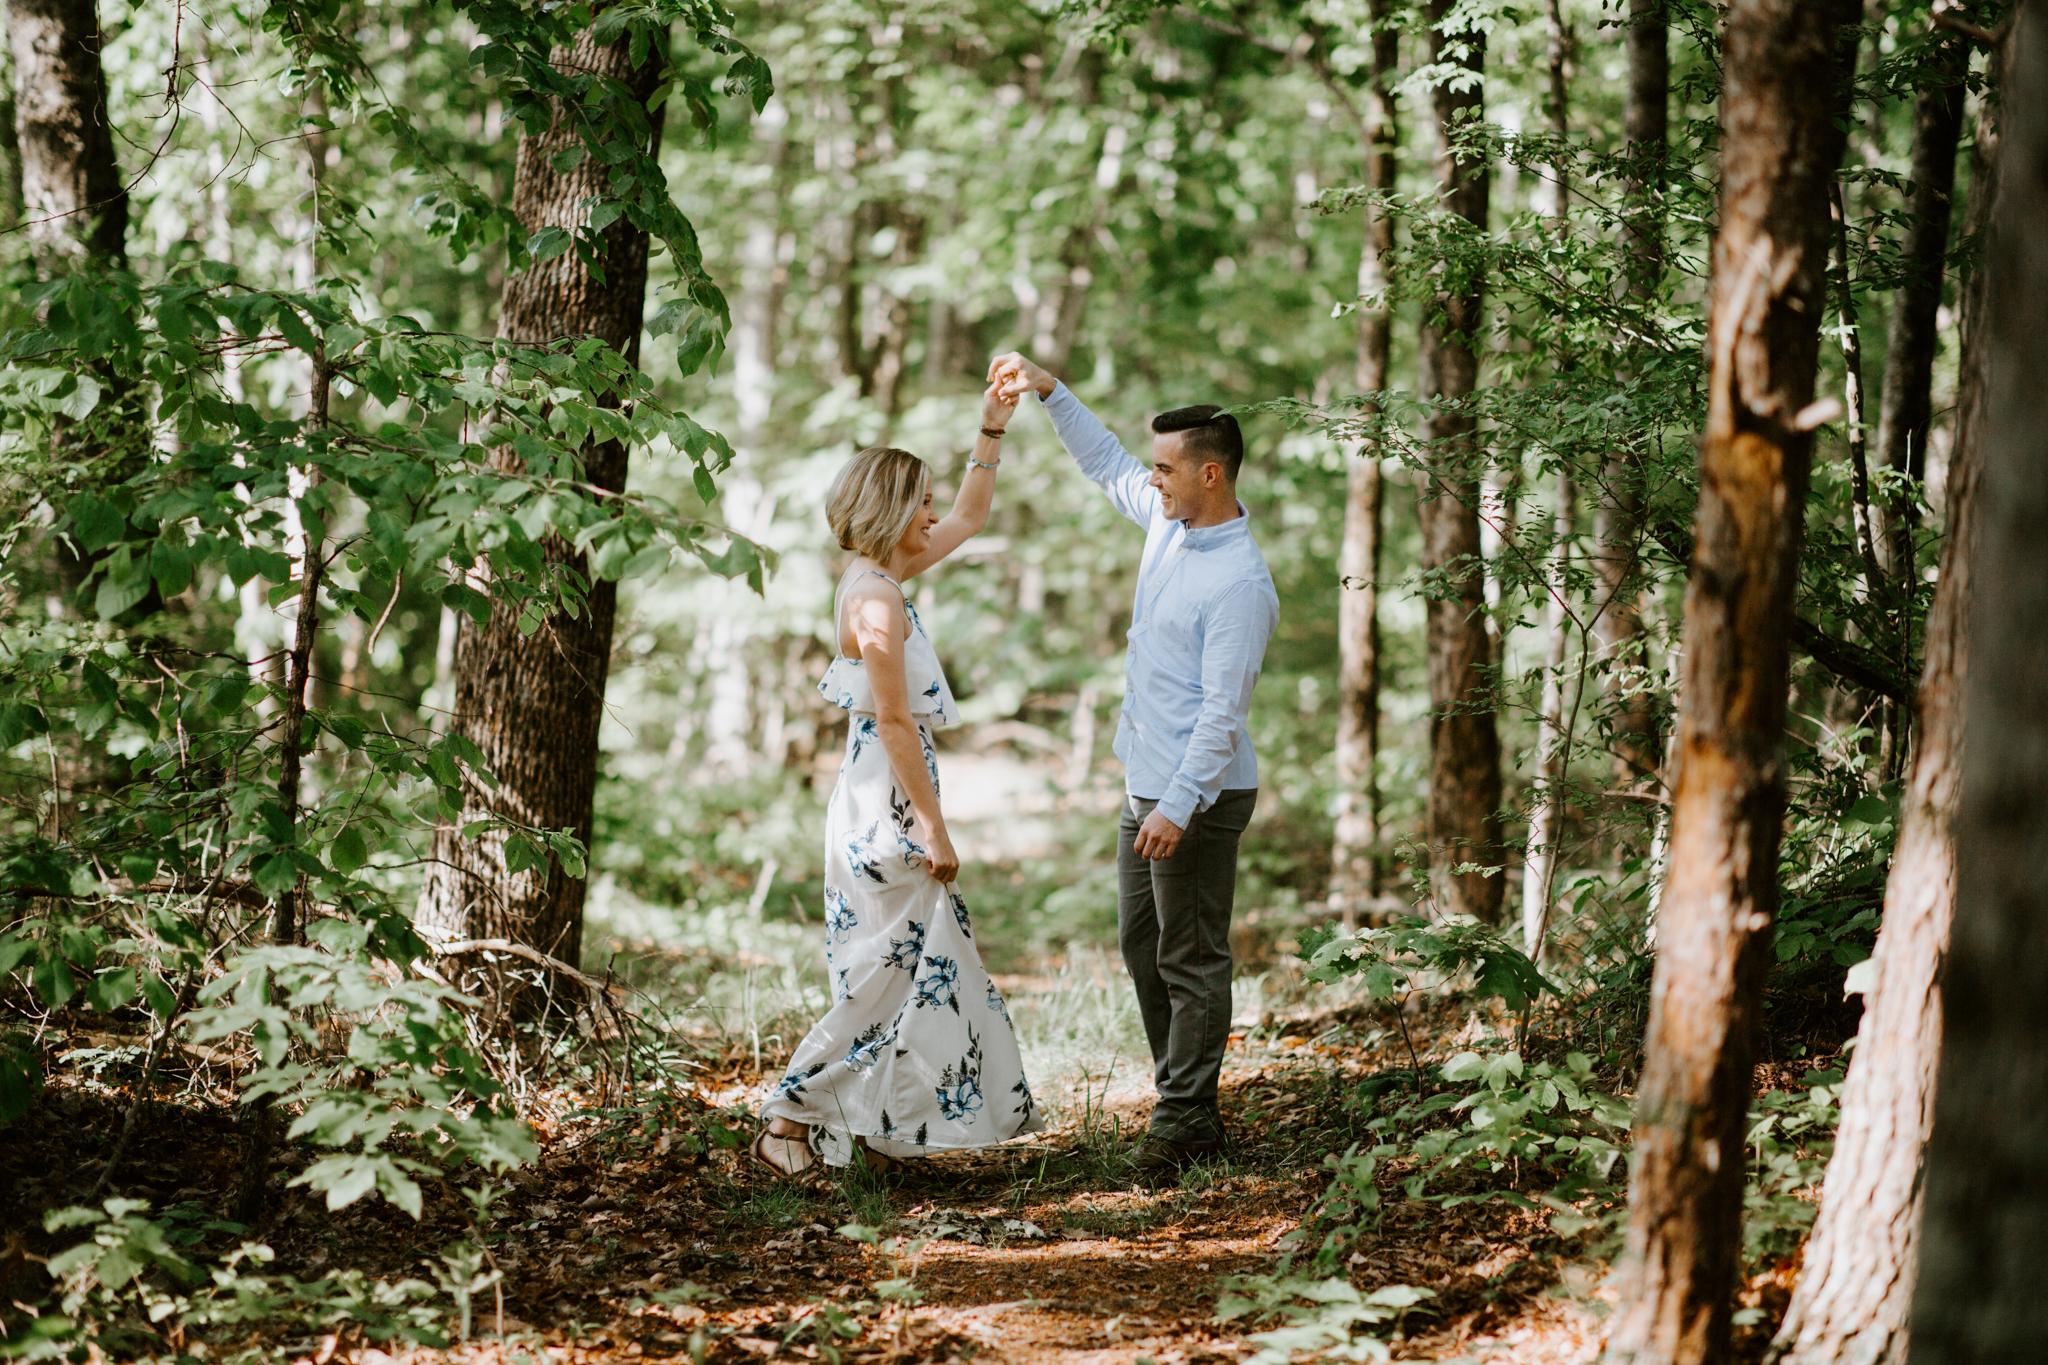 Courtney-Jordan-Chattanooga-Nashville-Tennessee-Wedding-Elopement-Photographer-25.jpg